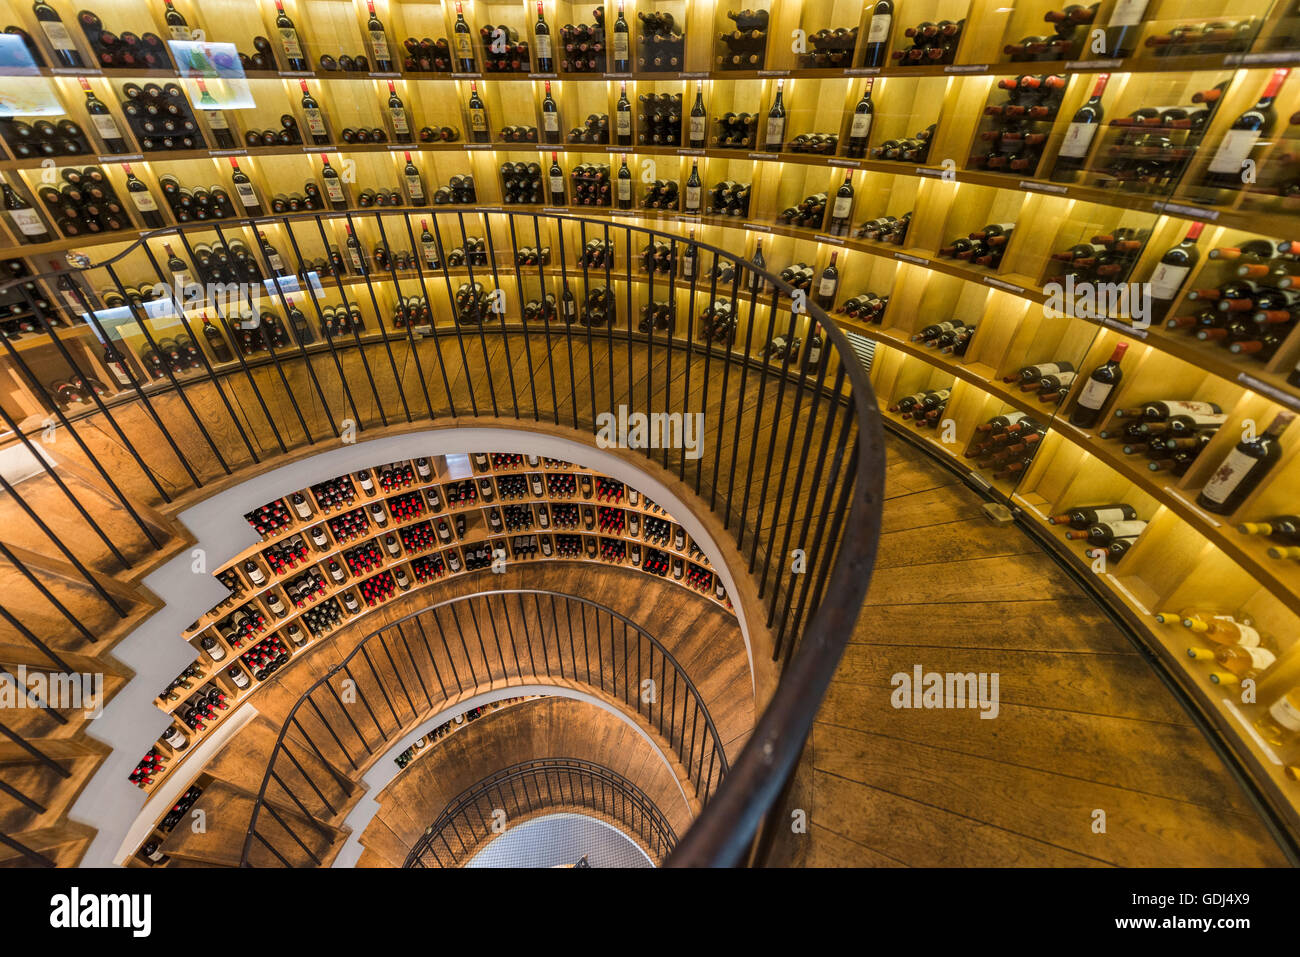 wine retailer L'Intendant at Bordeaux Stock Photo